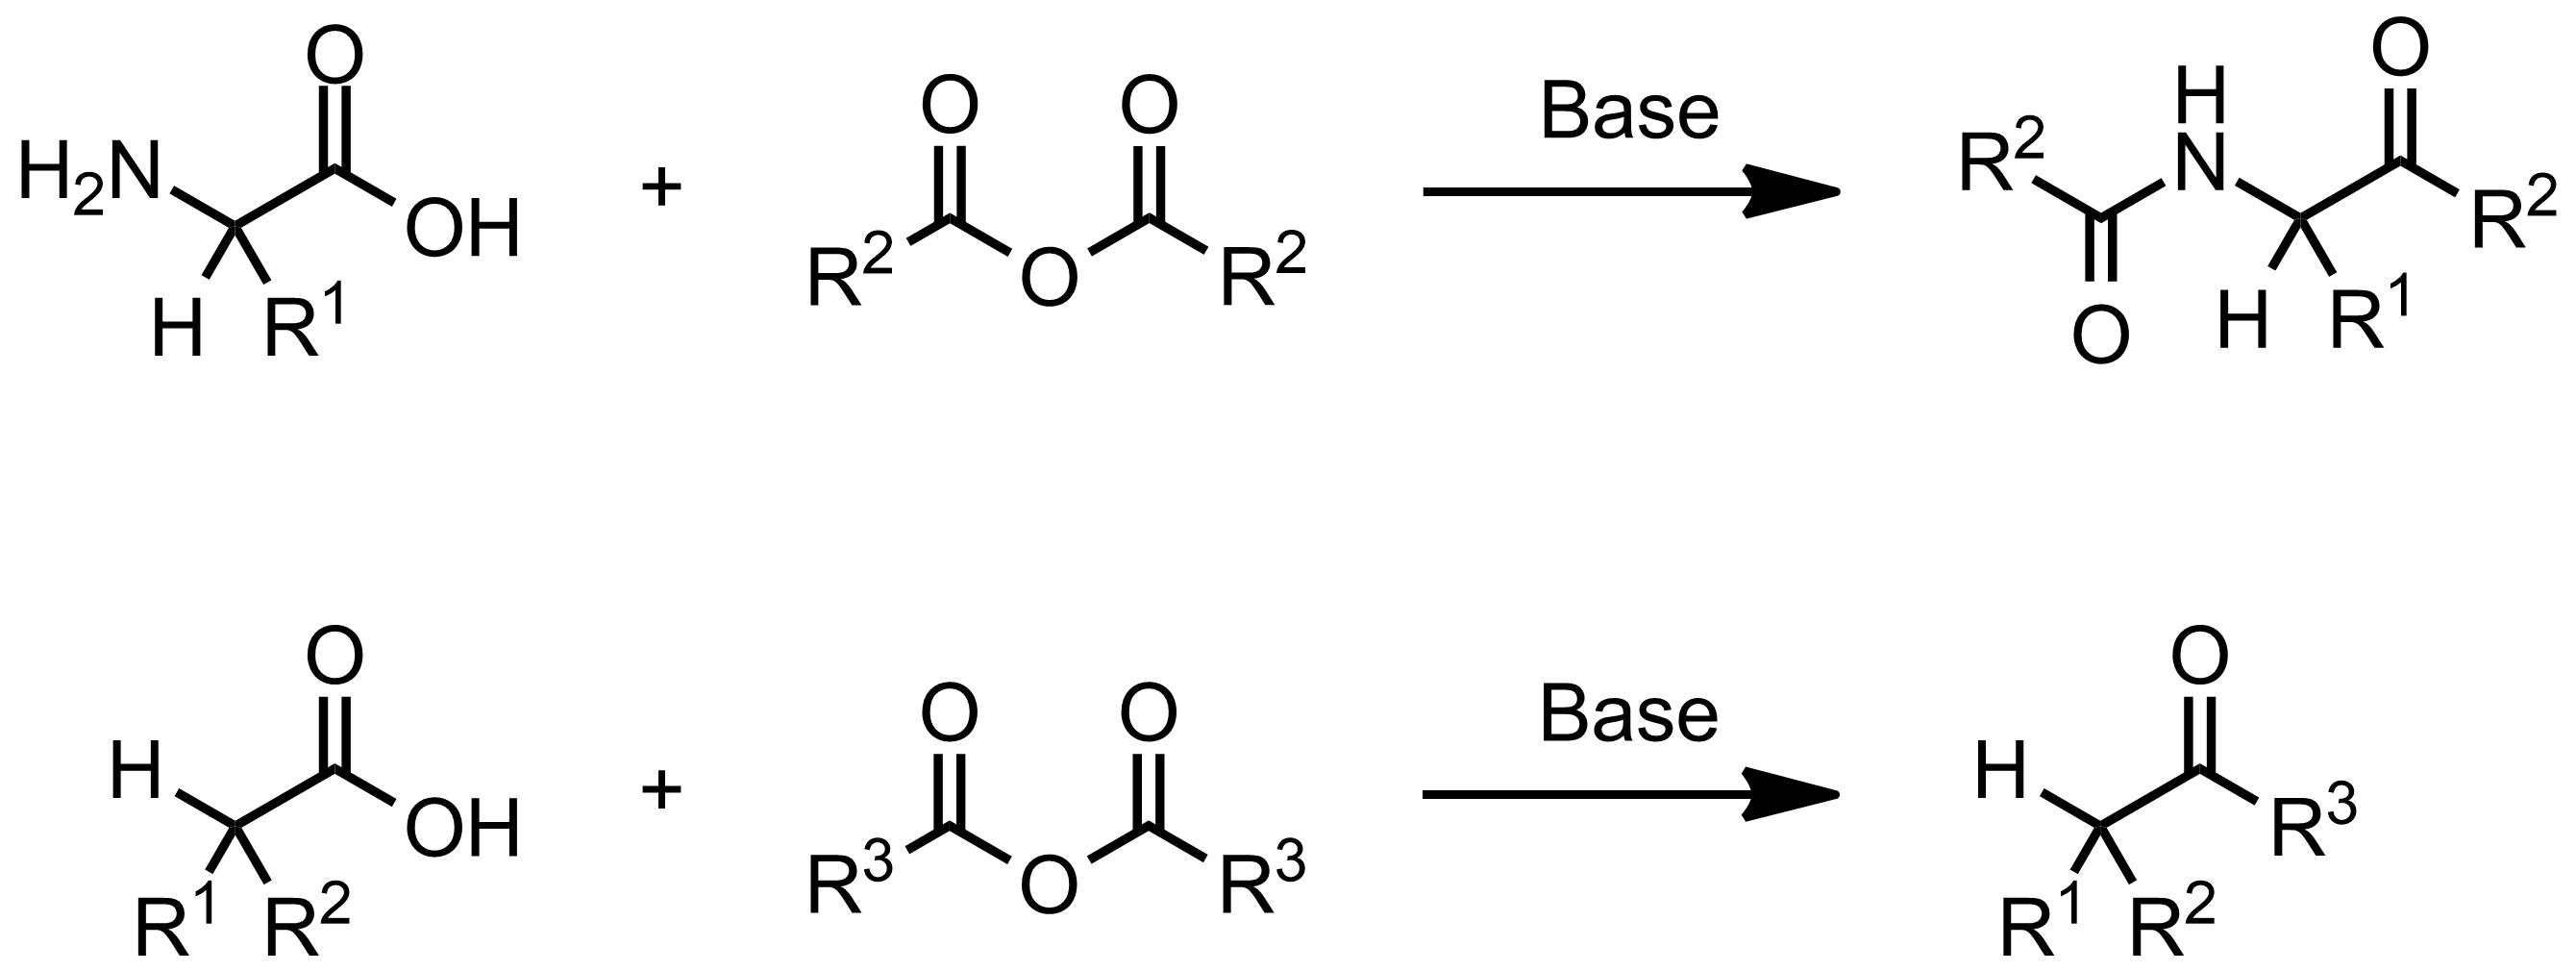 Schematic representation of the Dakin-West Reaction.